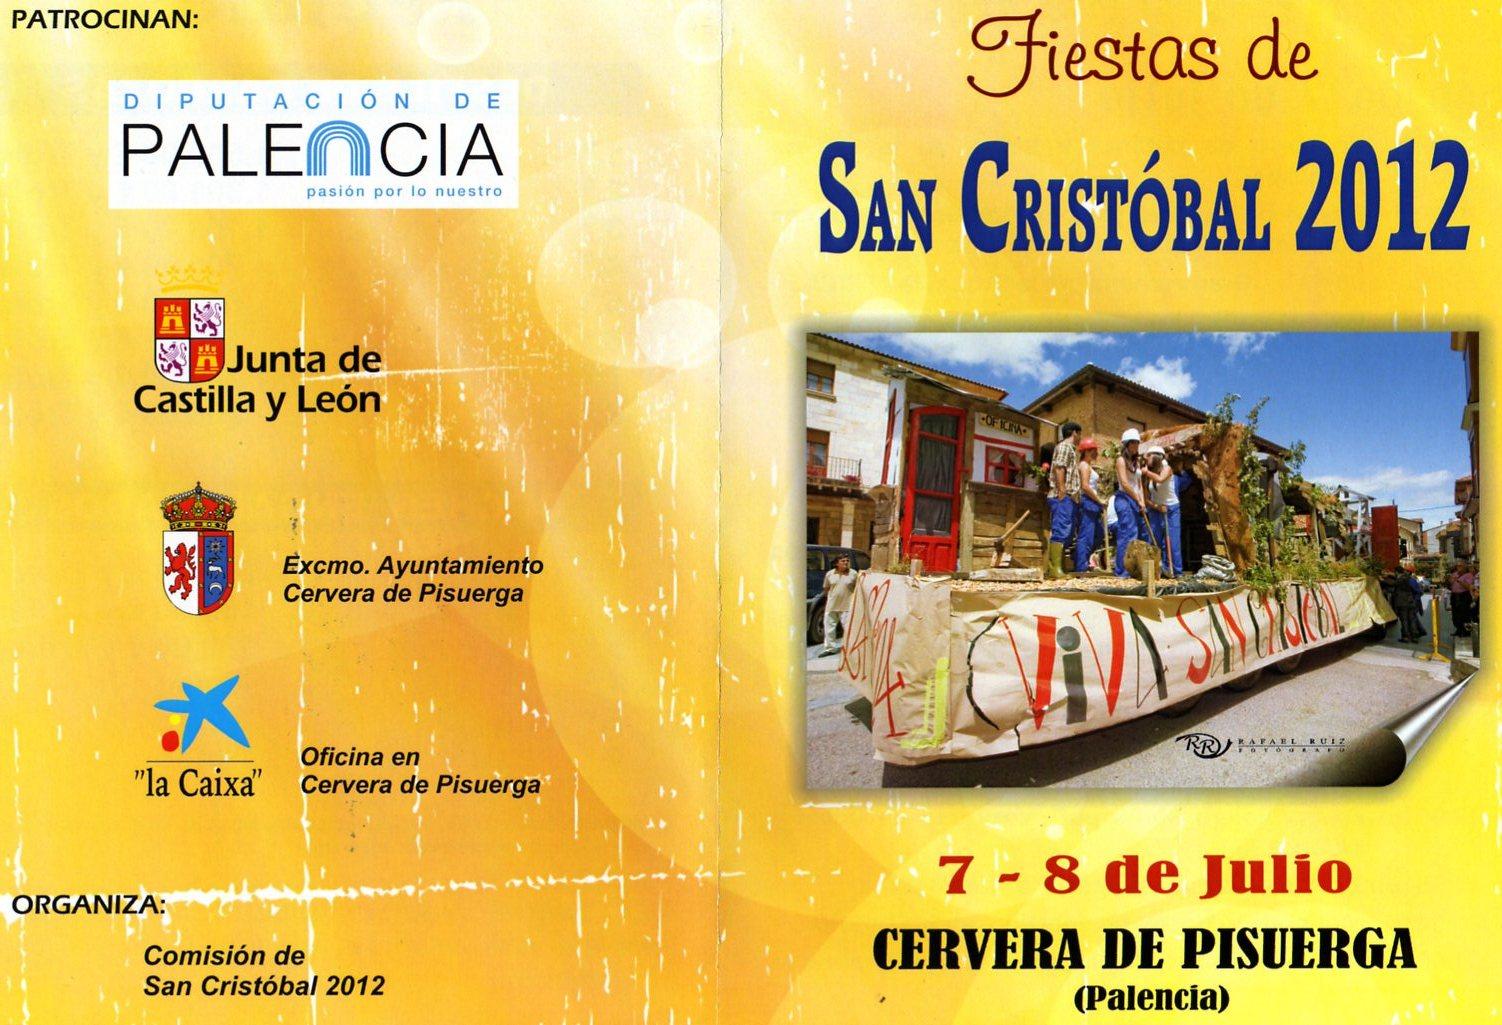 Fiestas de San Cristóbal 2012